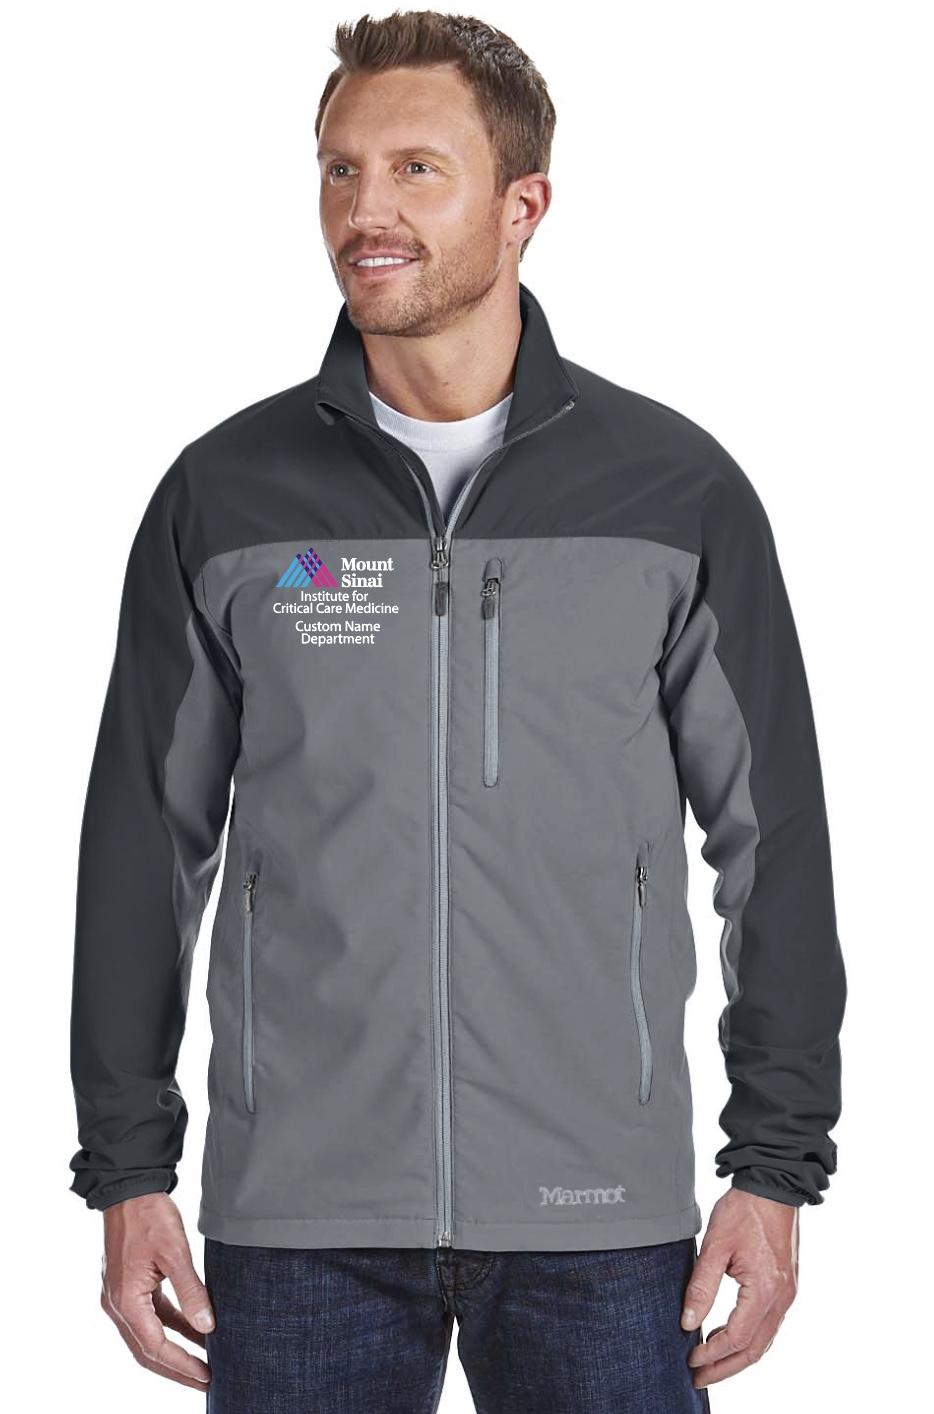 Mount Sinai Institute for Critical Care Medicine Men's Marmot Tempo Jacket